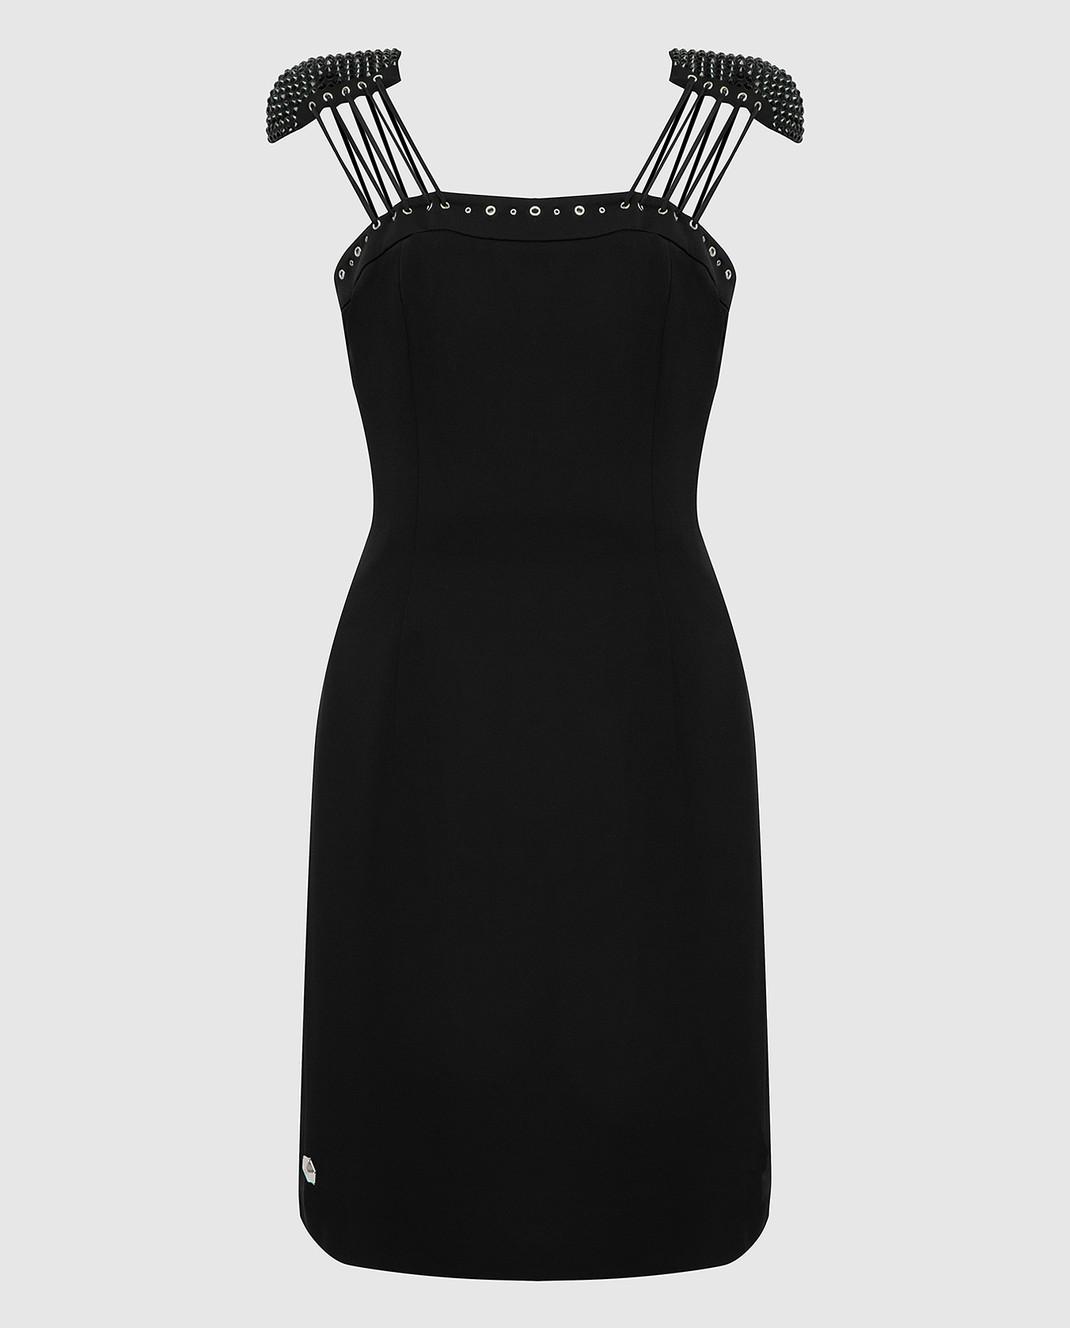 Philipp Plein Черное платье с кристаллами CWRG0060